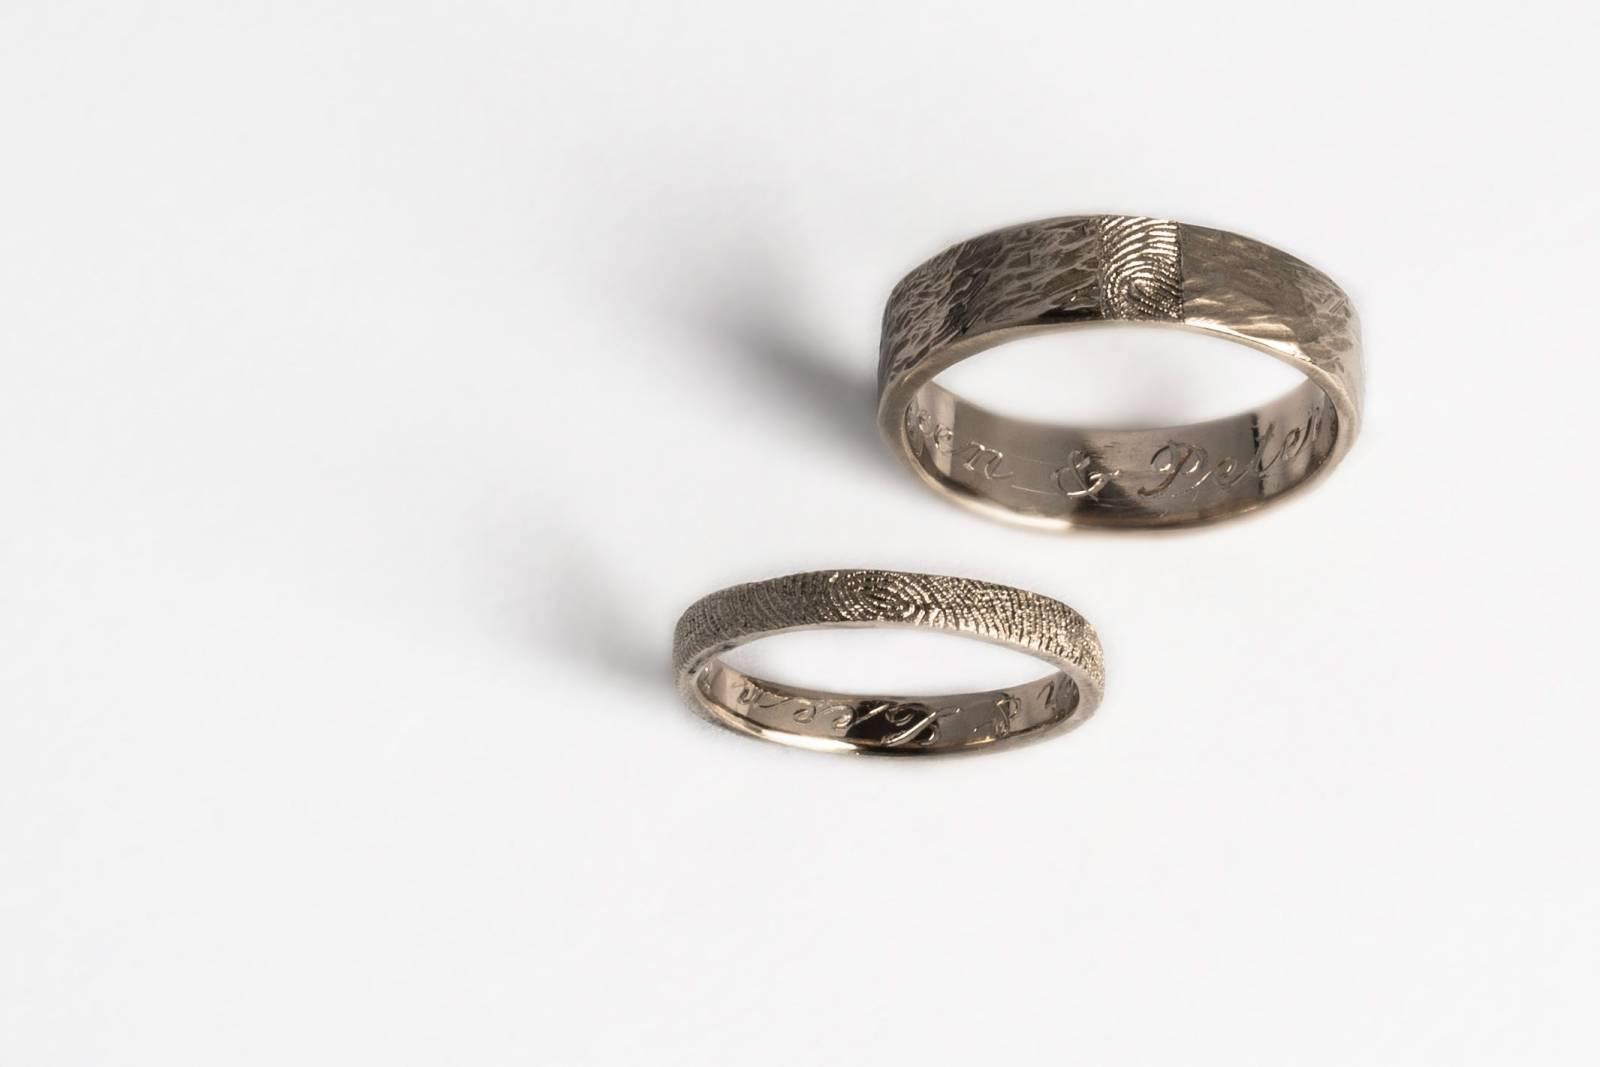 Nathalie Swinnen - Juwelen - Bruidsjuwelen - Verlovingsring - Trouwring - House of Weddings - 30